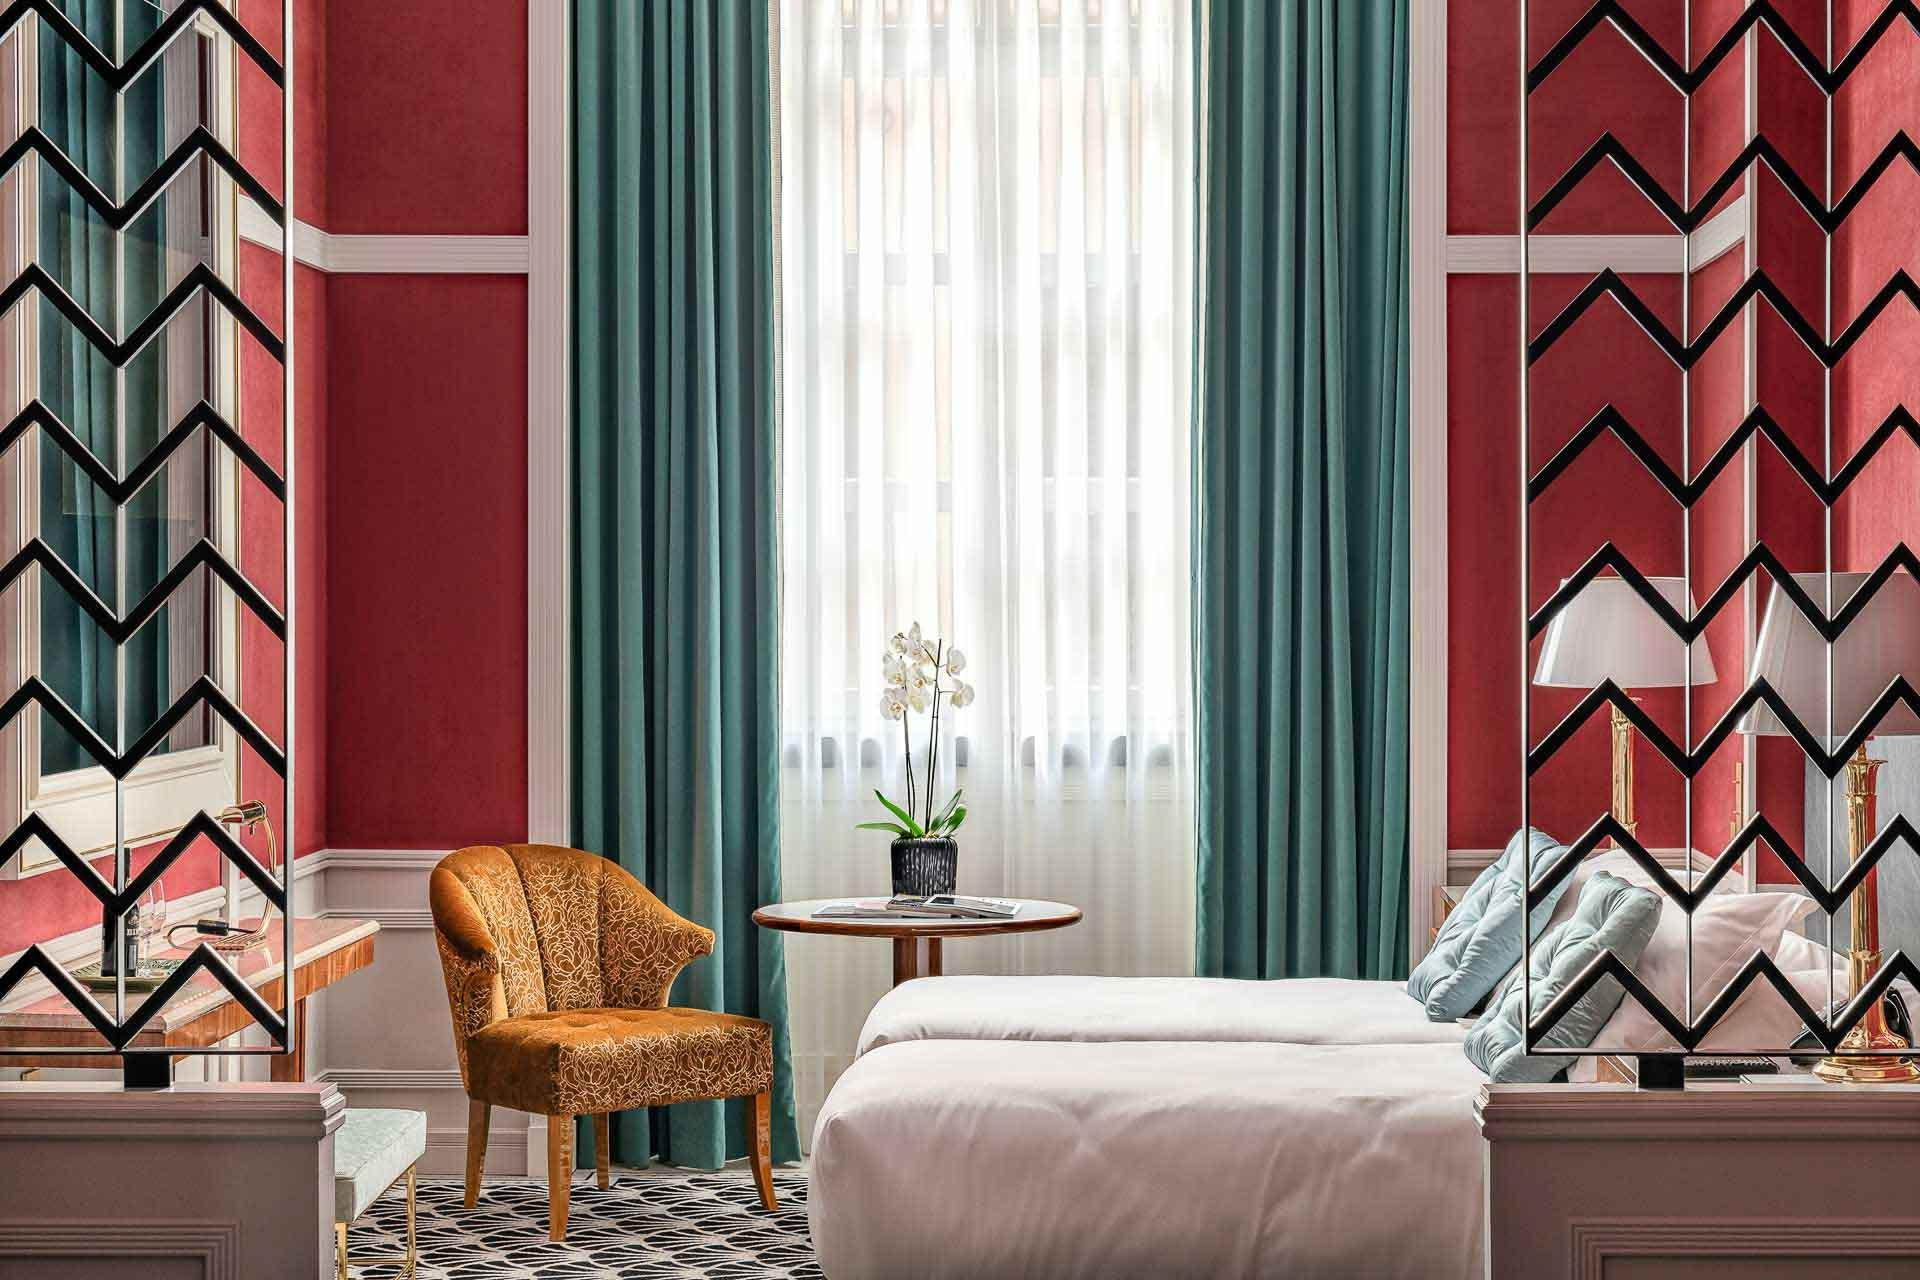 Le Maison Albar Hotels Le Monumental Palace © Francesco Almeida Dias